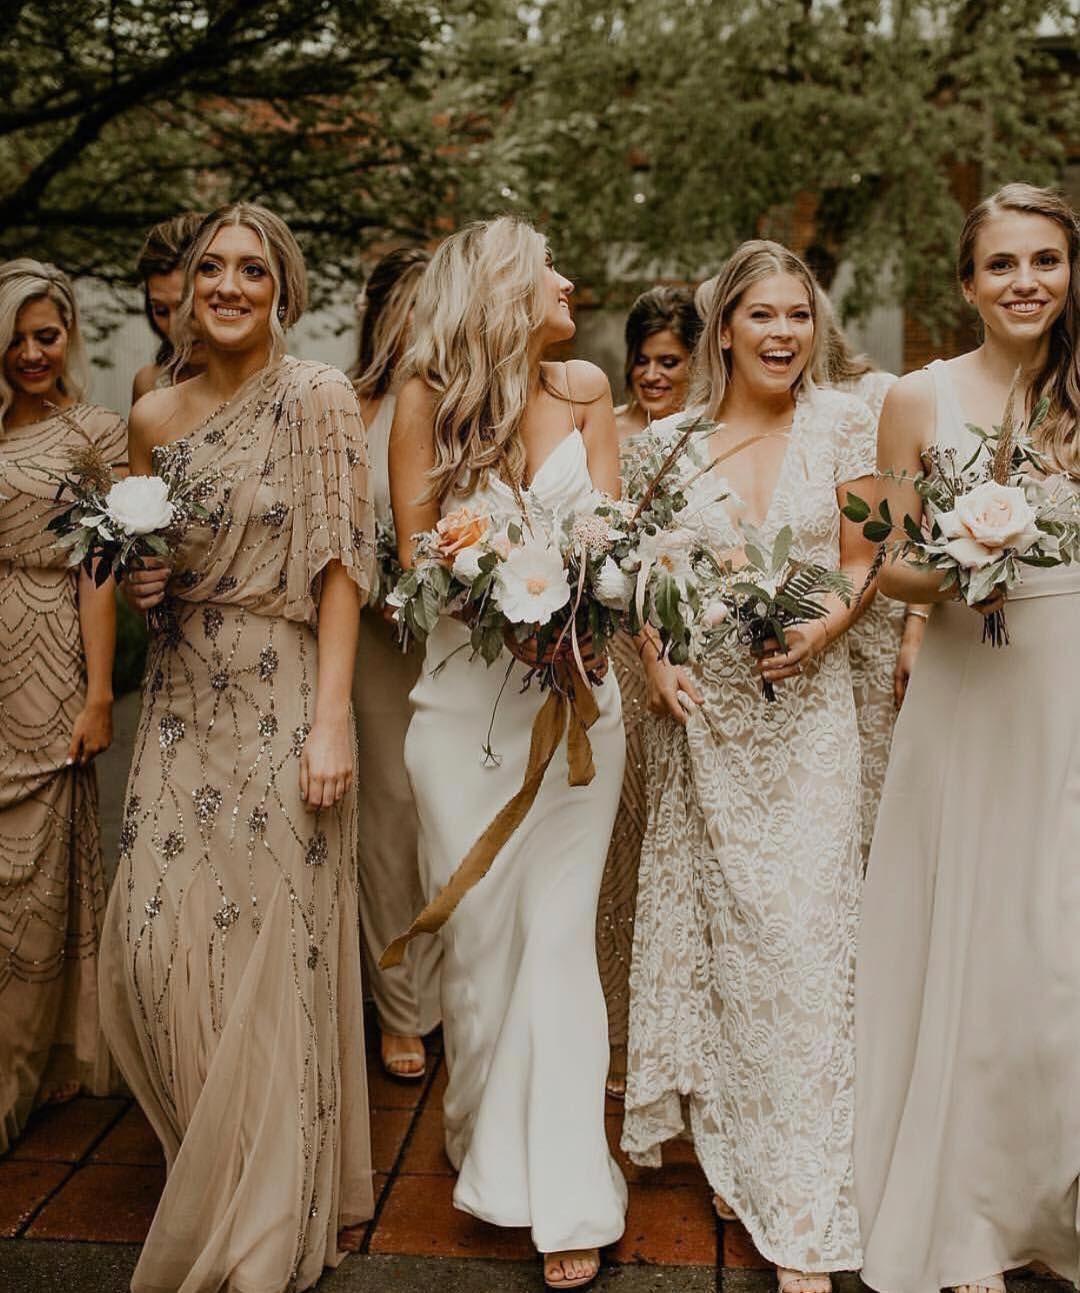 Eleanor Maxi Dress Lovers Lace Show Me The Ring Neutral Bridesmaid Dresses Bridesmaid Dresses Boho Mismatched Bridesmaid Dresses